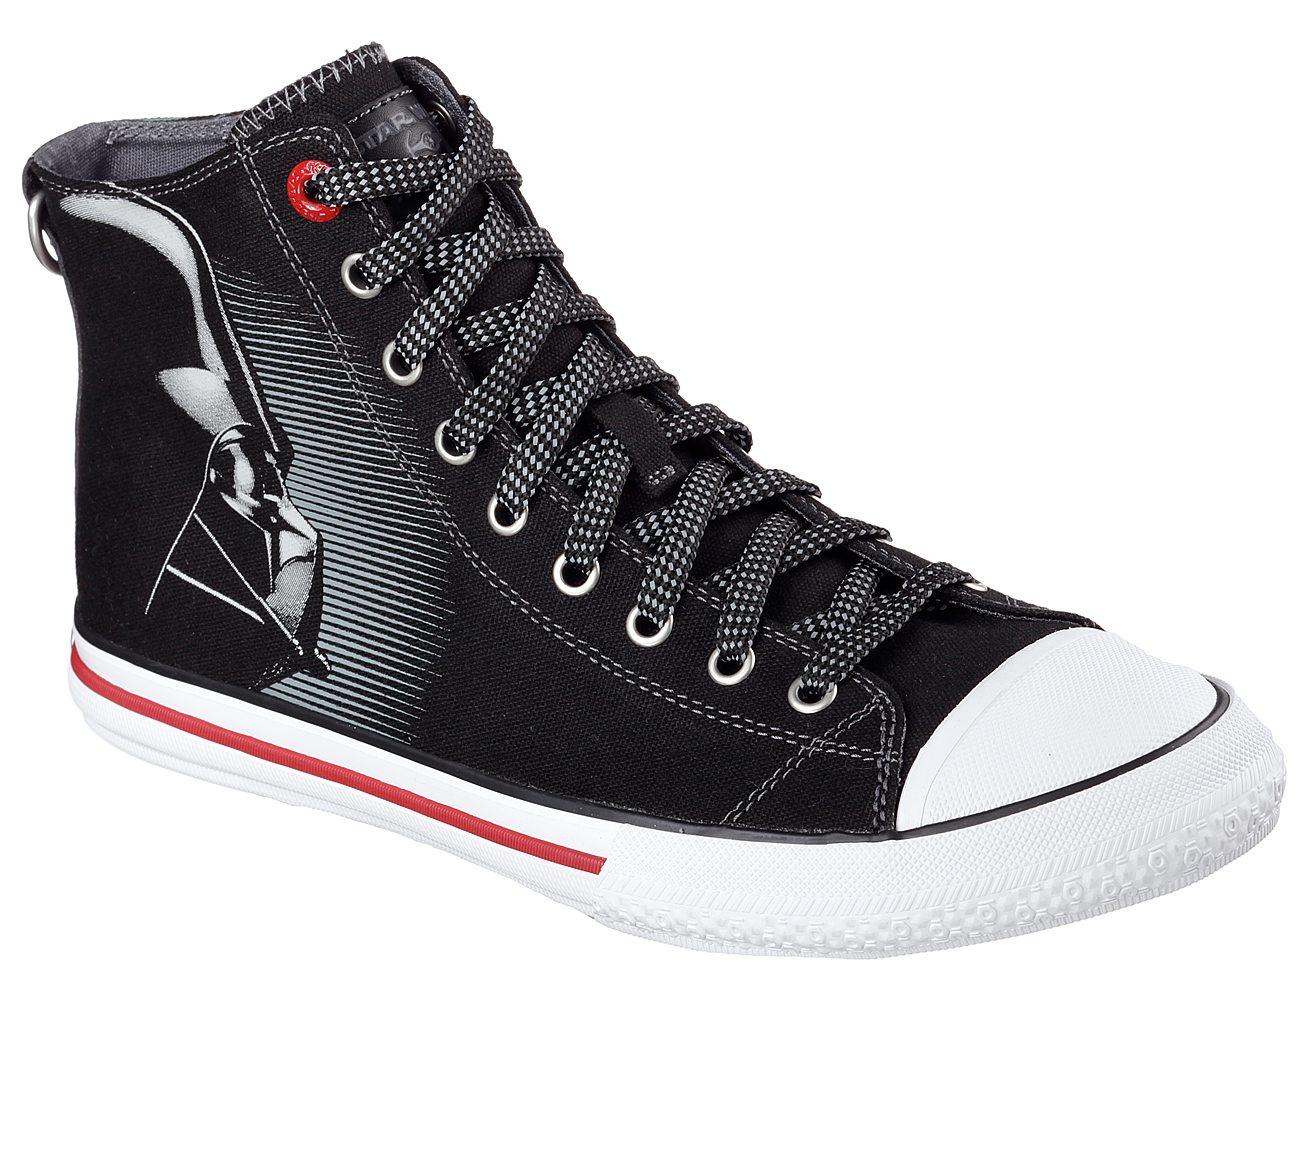 Star Wars Sneakers >> Buy Skechers Star Wars Legacy Vulc Vader Reflective High Top